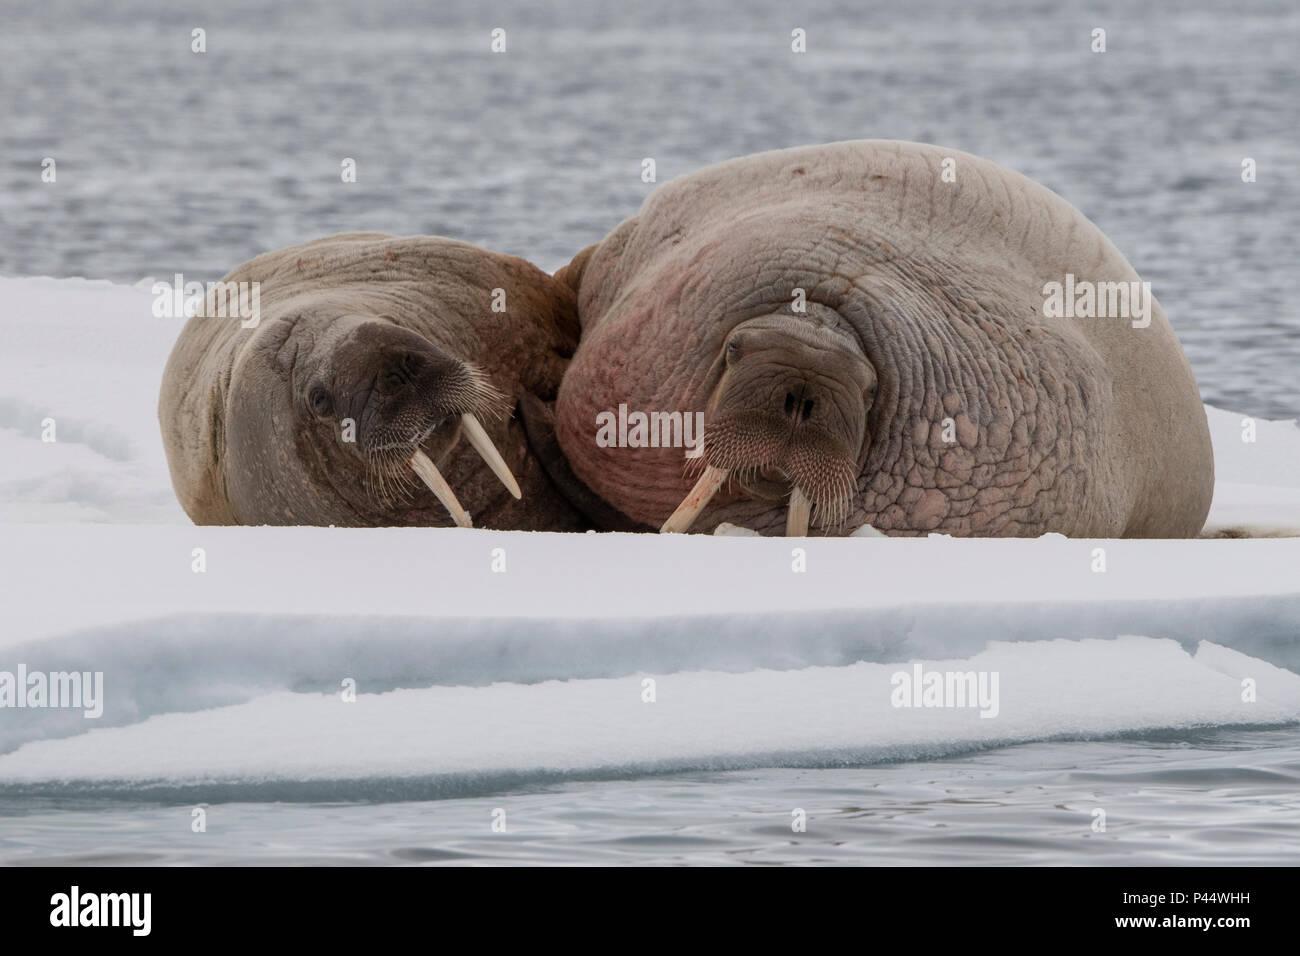 Noruega, Svalbard, Nordaustlandet, Austfonna. La morsa (Odobenus rosmarus) sobre el hielo. Imagen De Stock